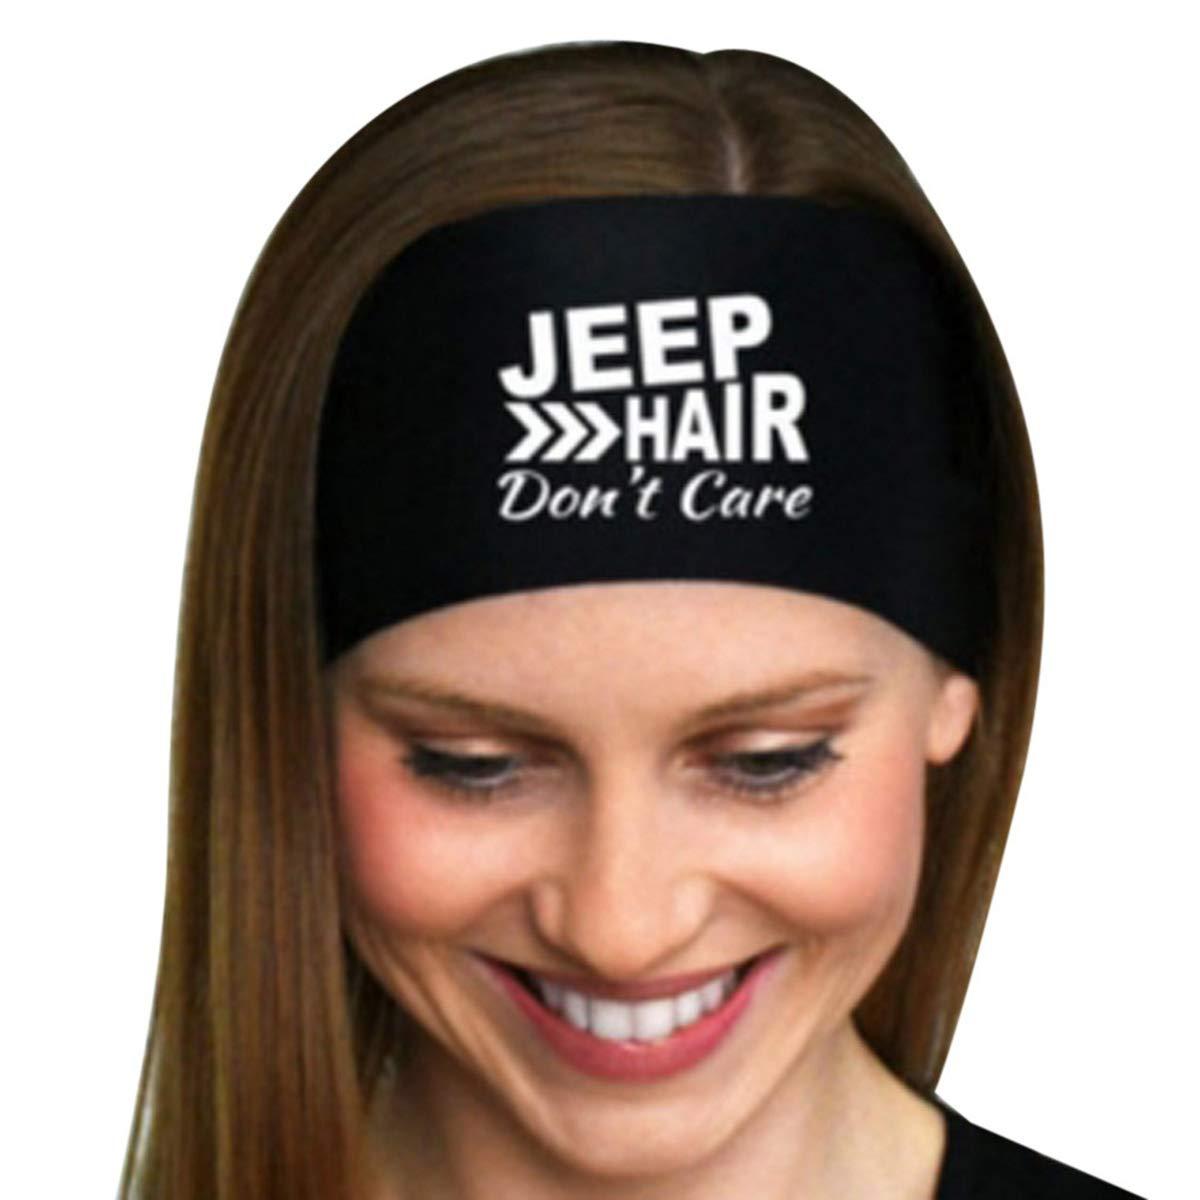 HeadBand Men Cotton Letter Striped New Sport Yoga Women Girls Boys Black